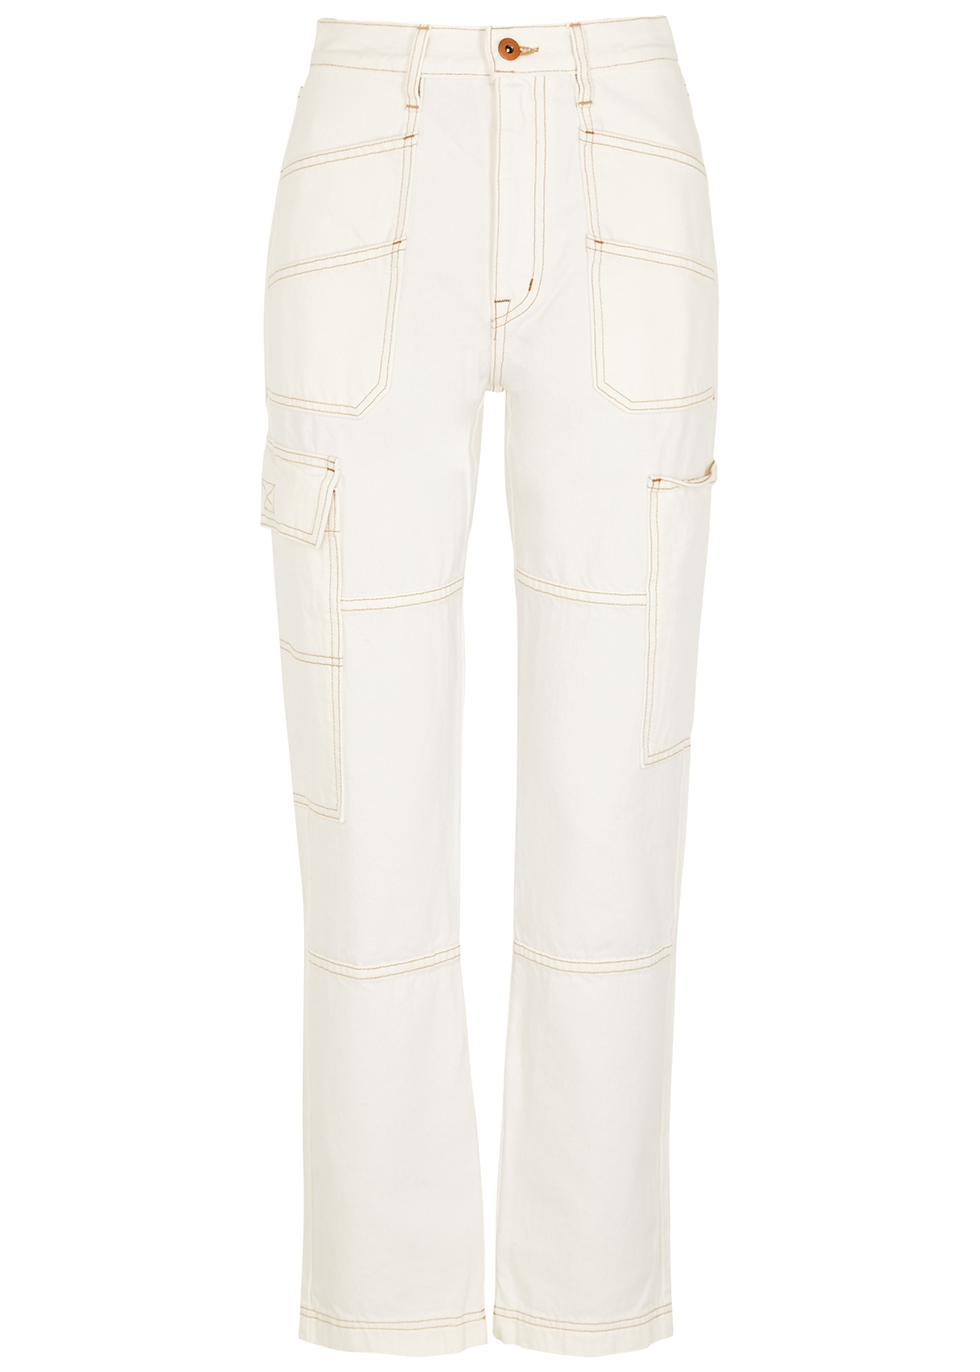 Saviour off-white straight-leg jeans